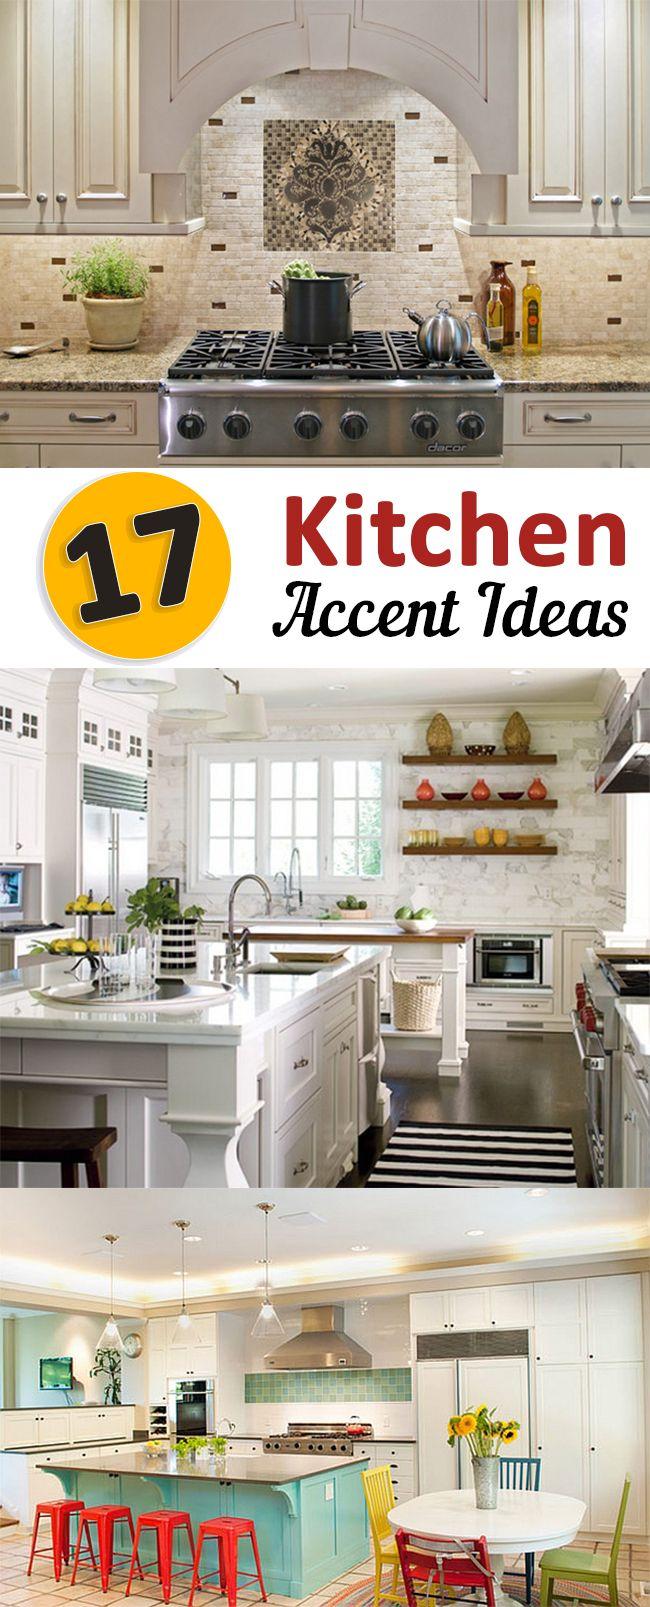 231 best Home Ideas images on Pinterest   Christmas ideas, Apartment ...